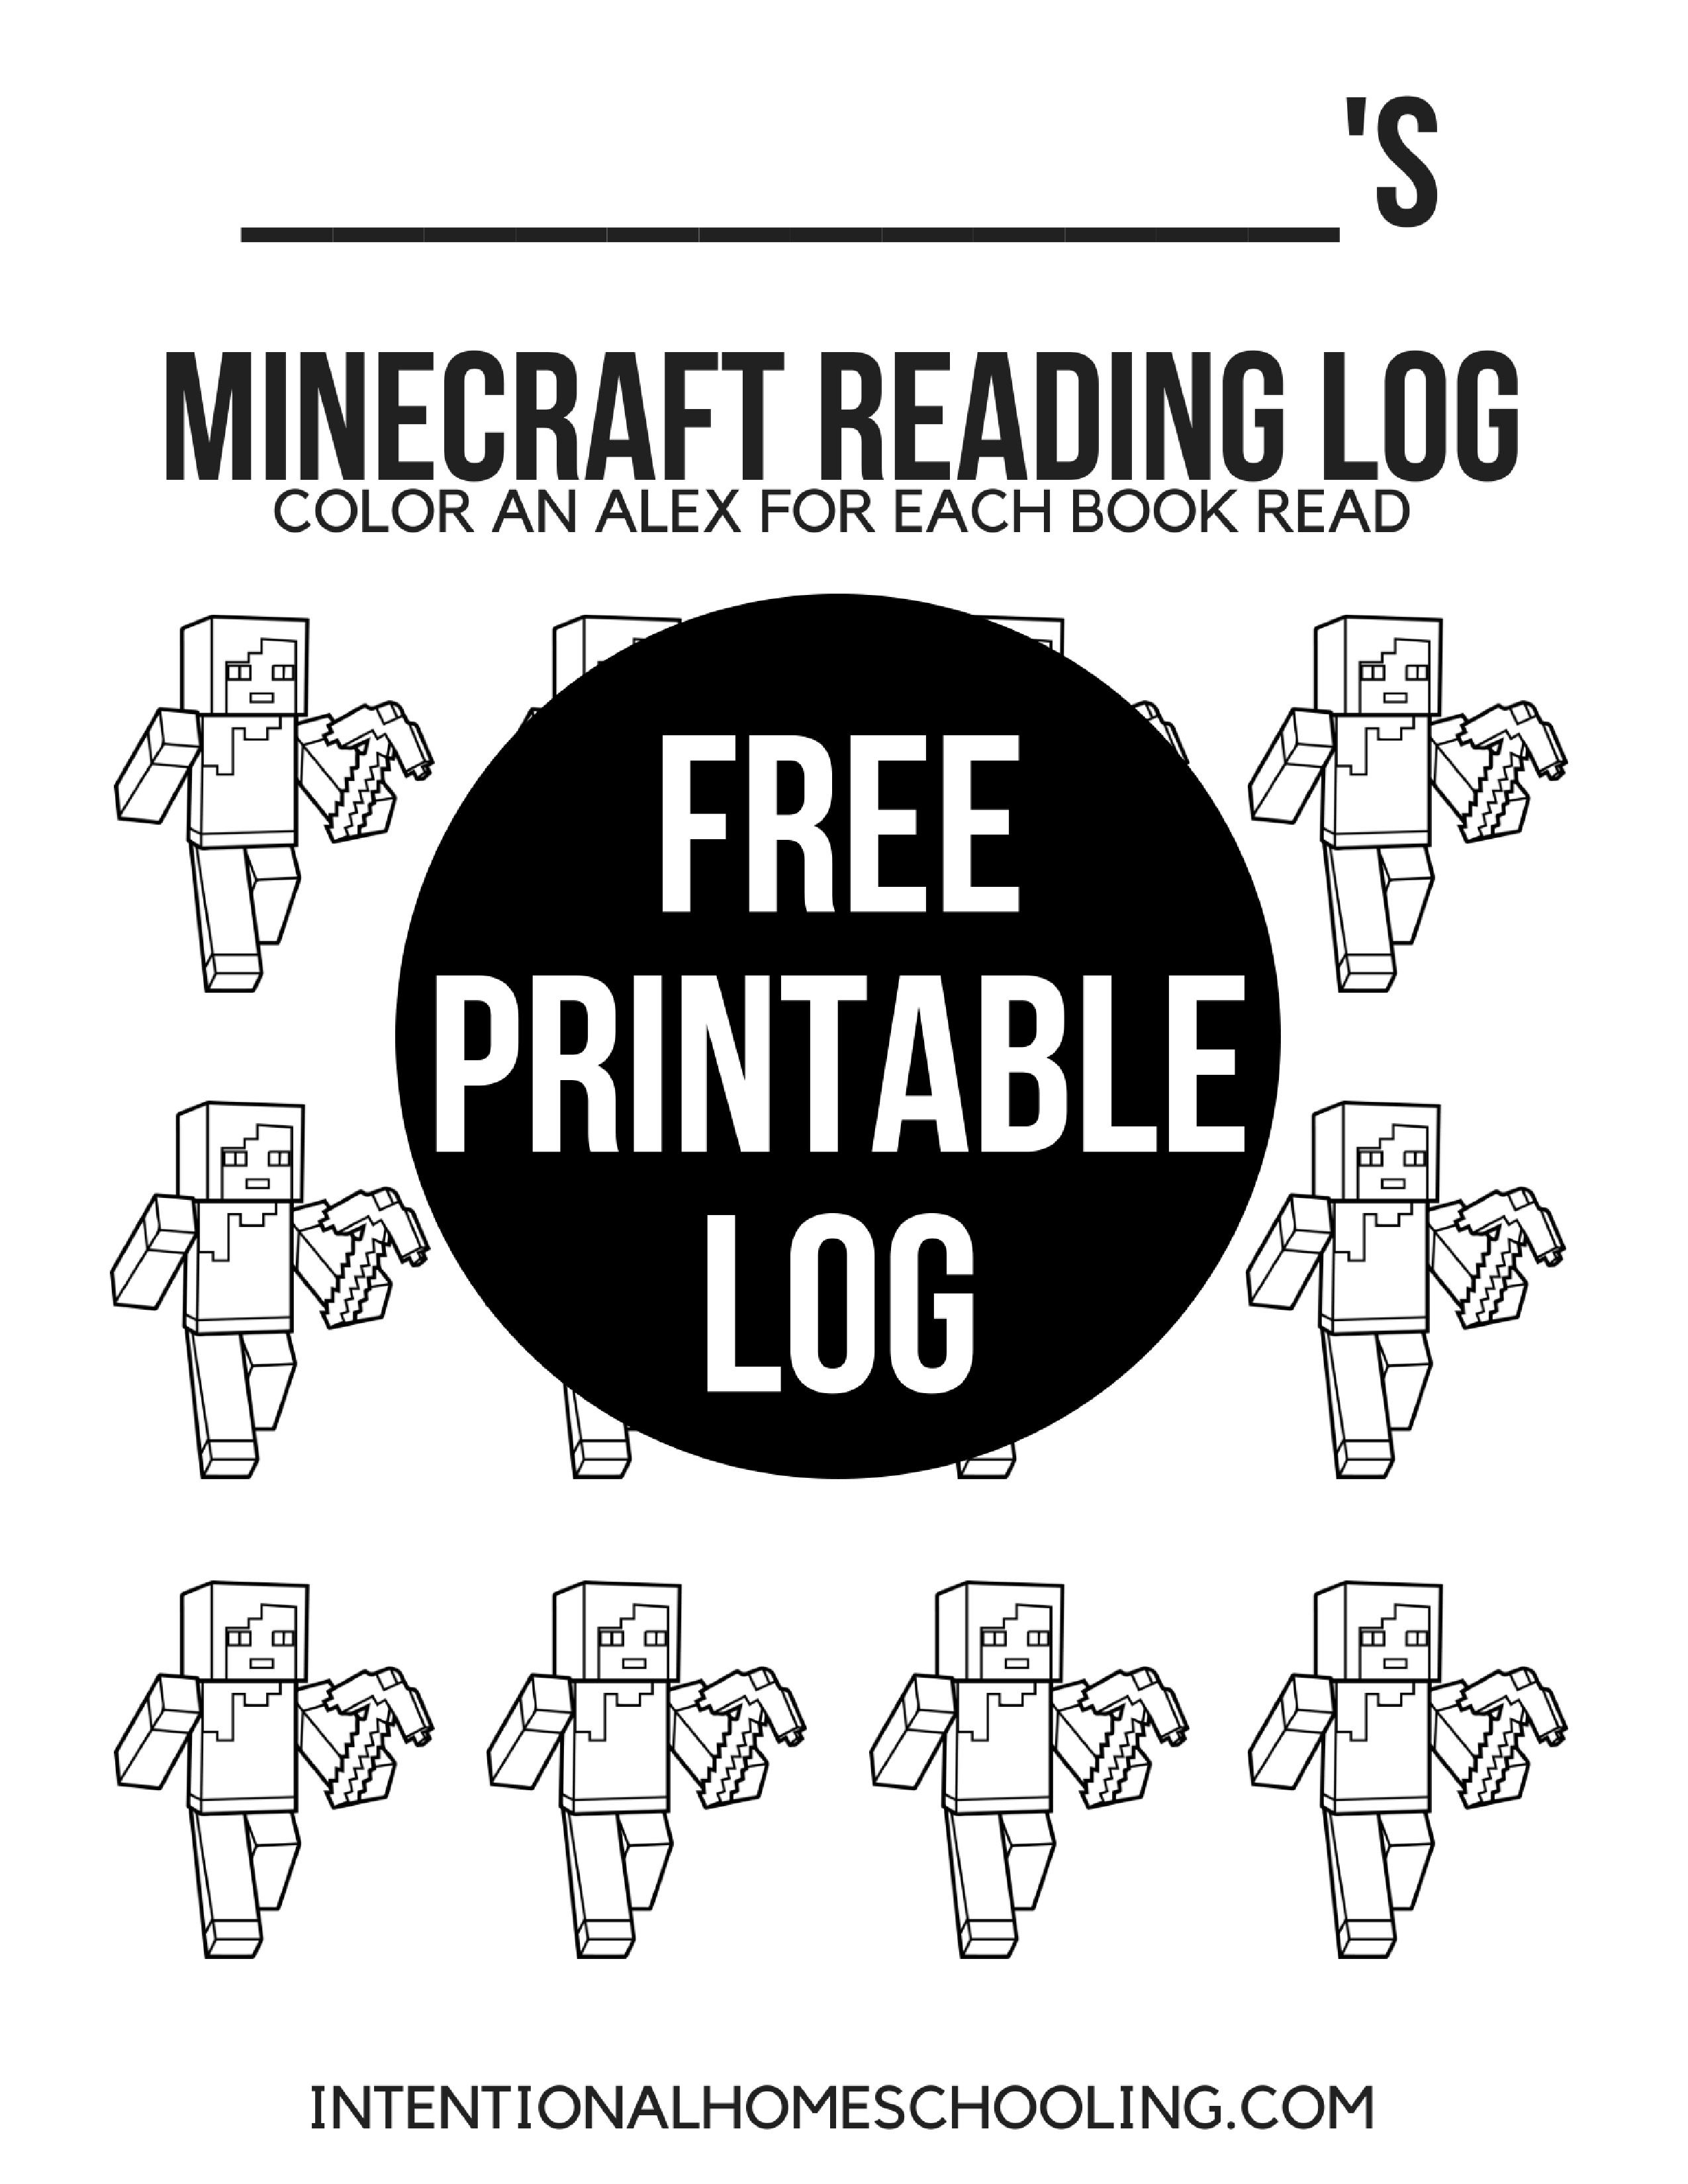 Printable Minecraft Reading Log